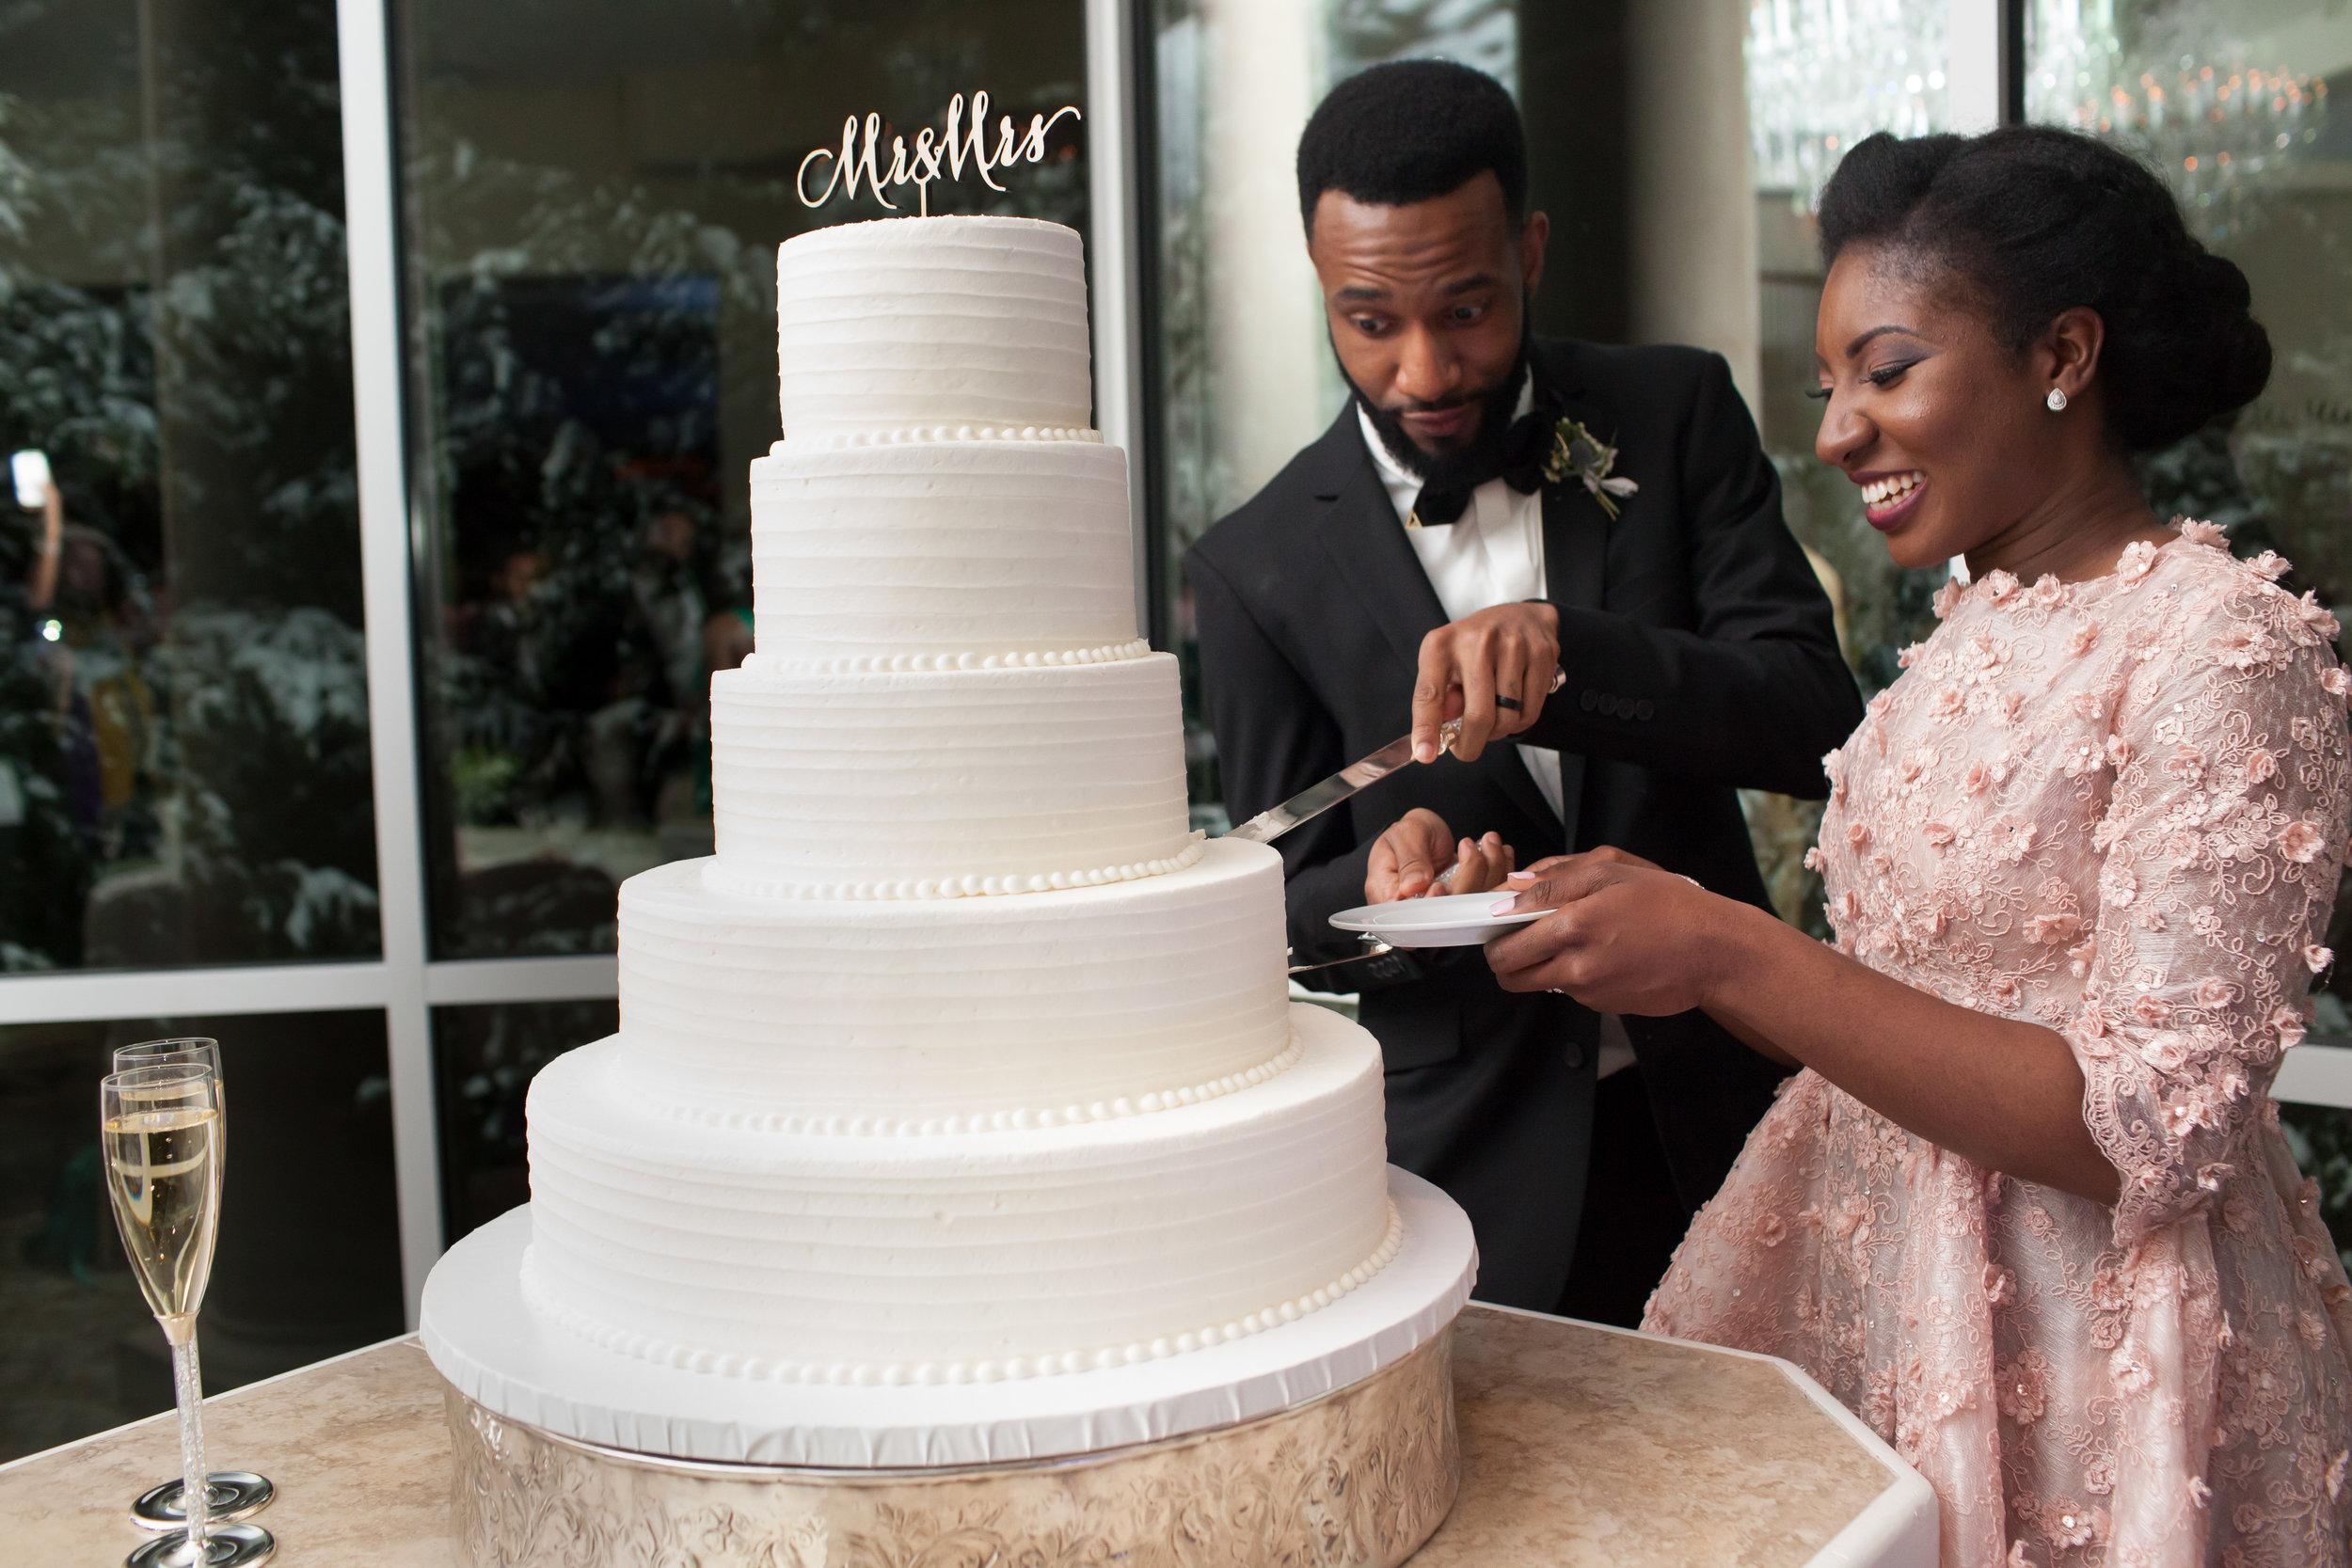 Columbus Ohio Wedding Planner - Aisle & Middle - Nigerian American Wedding in Dallas